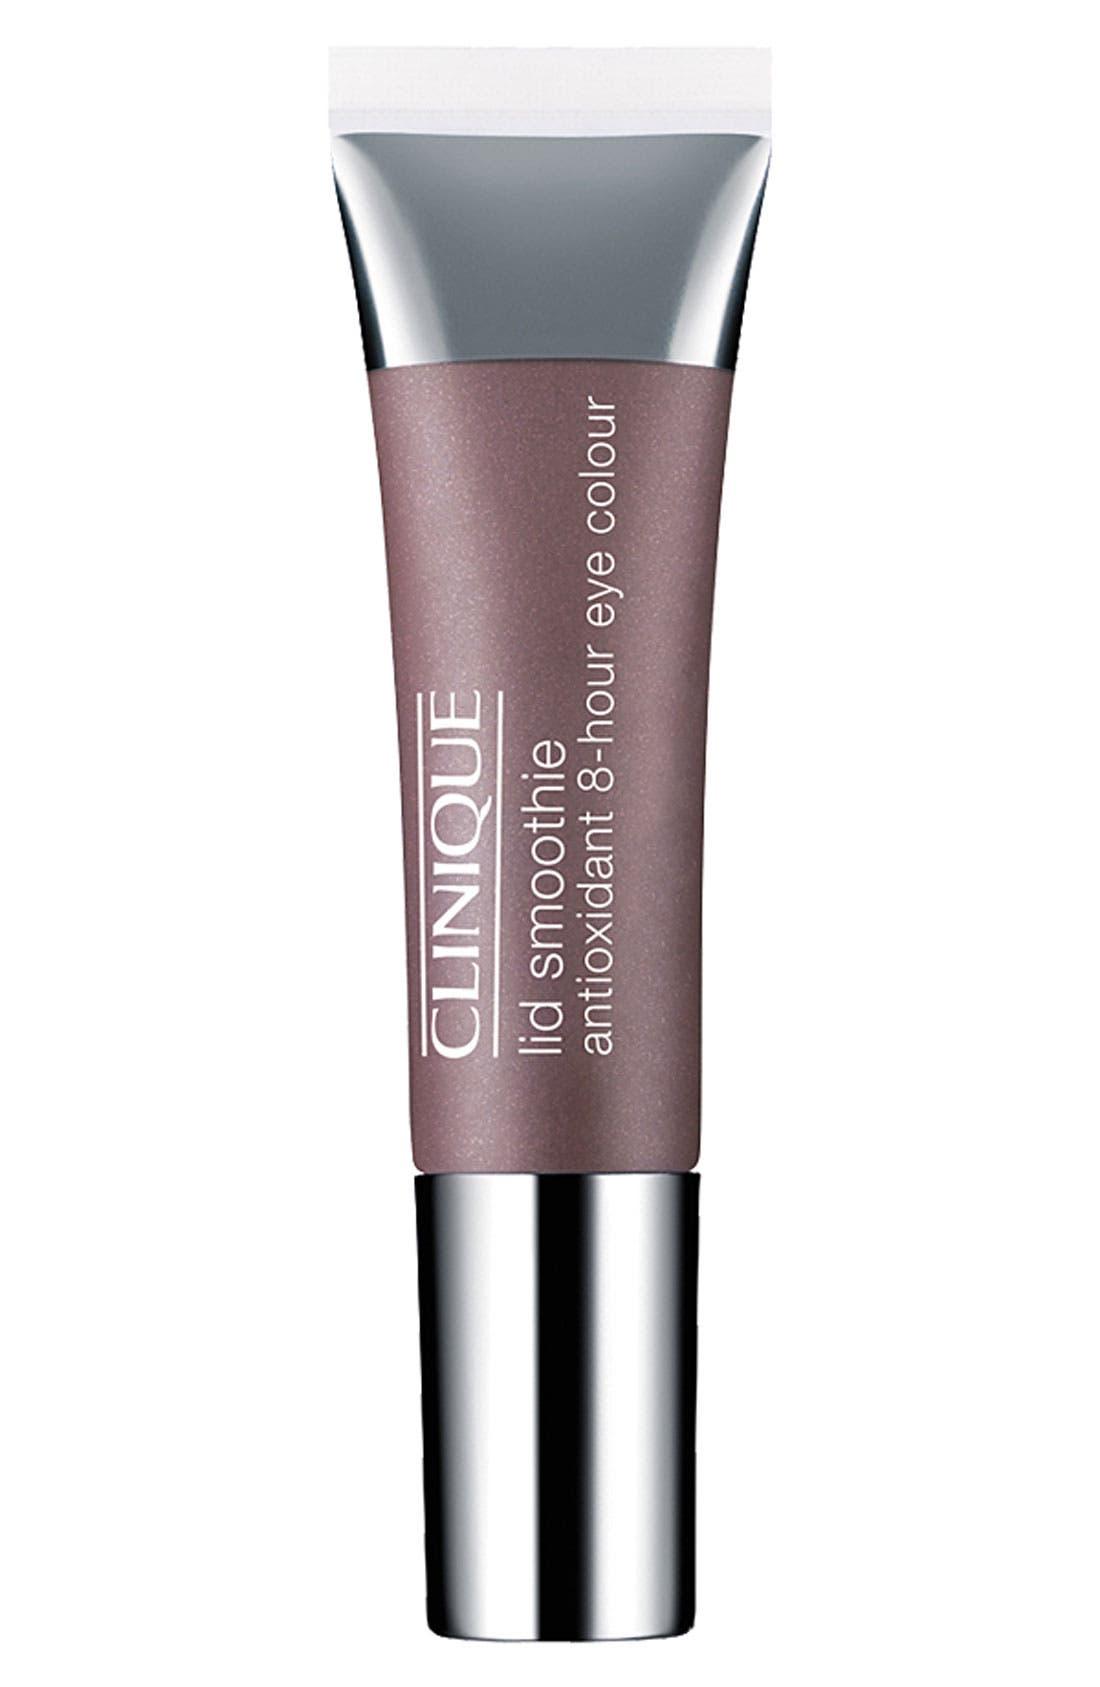 Clinique 'Lid Smoothie' Antioxidant 8-Hour Eye Colour